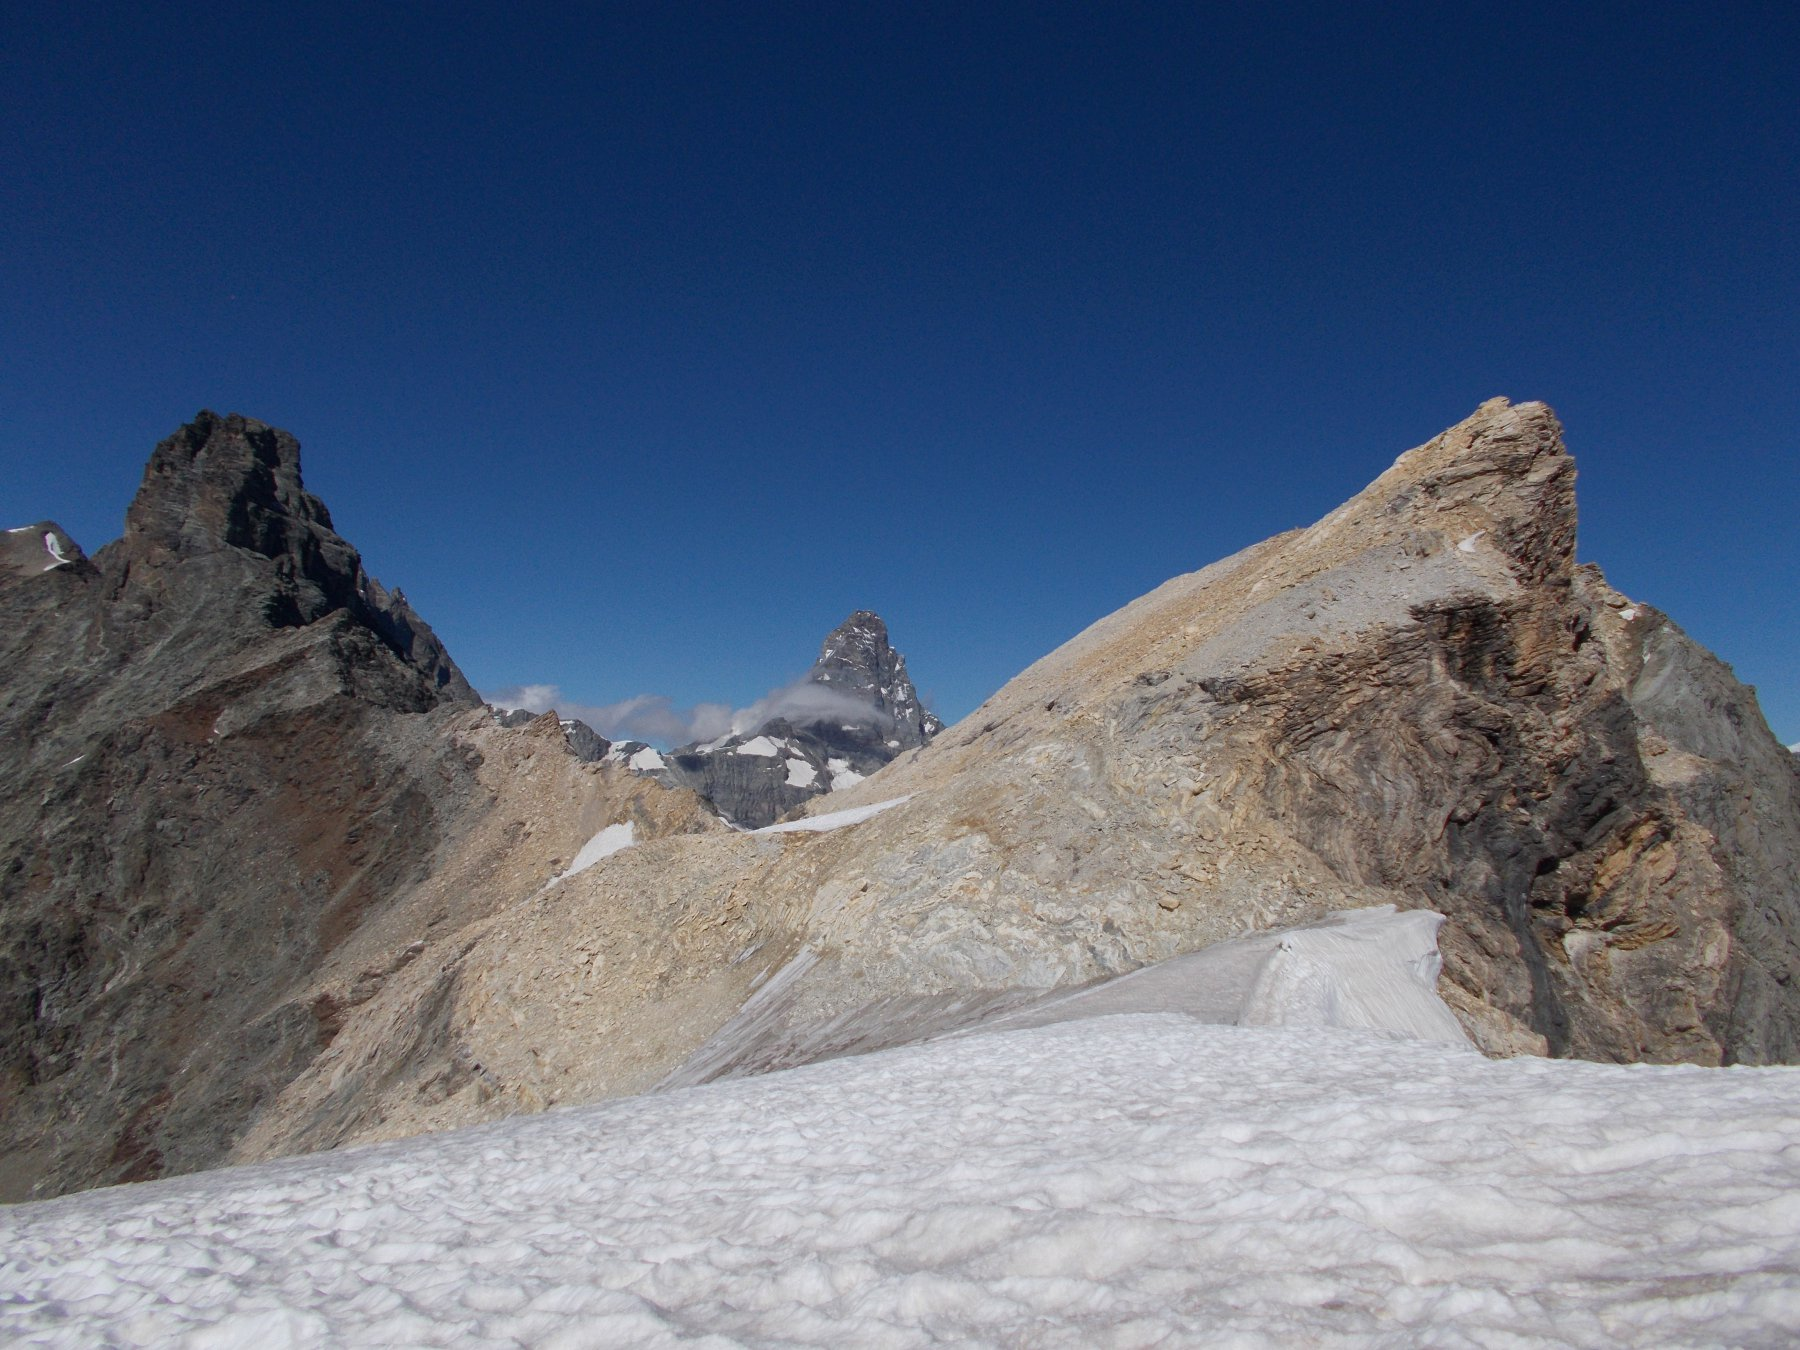 ..al Col des Dames..con il Mont Blanc du Creton a dx le Petit Murailles a sx e il Cervino in mezzo..